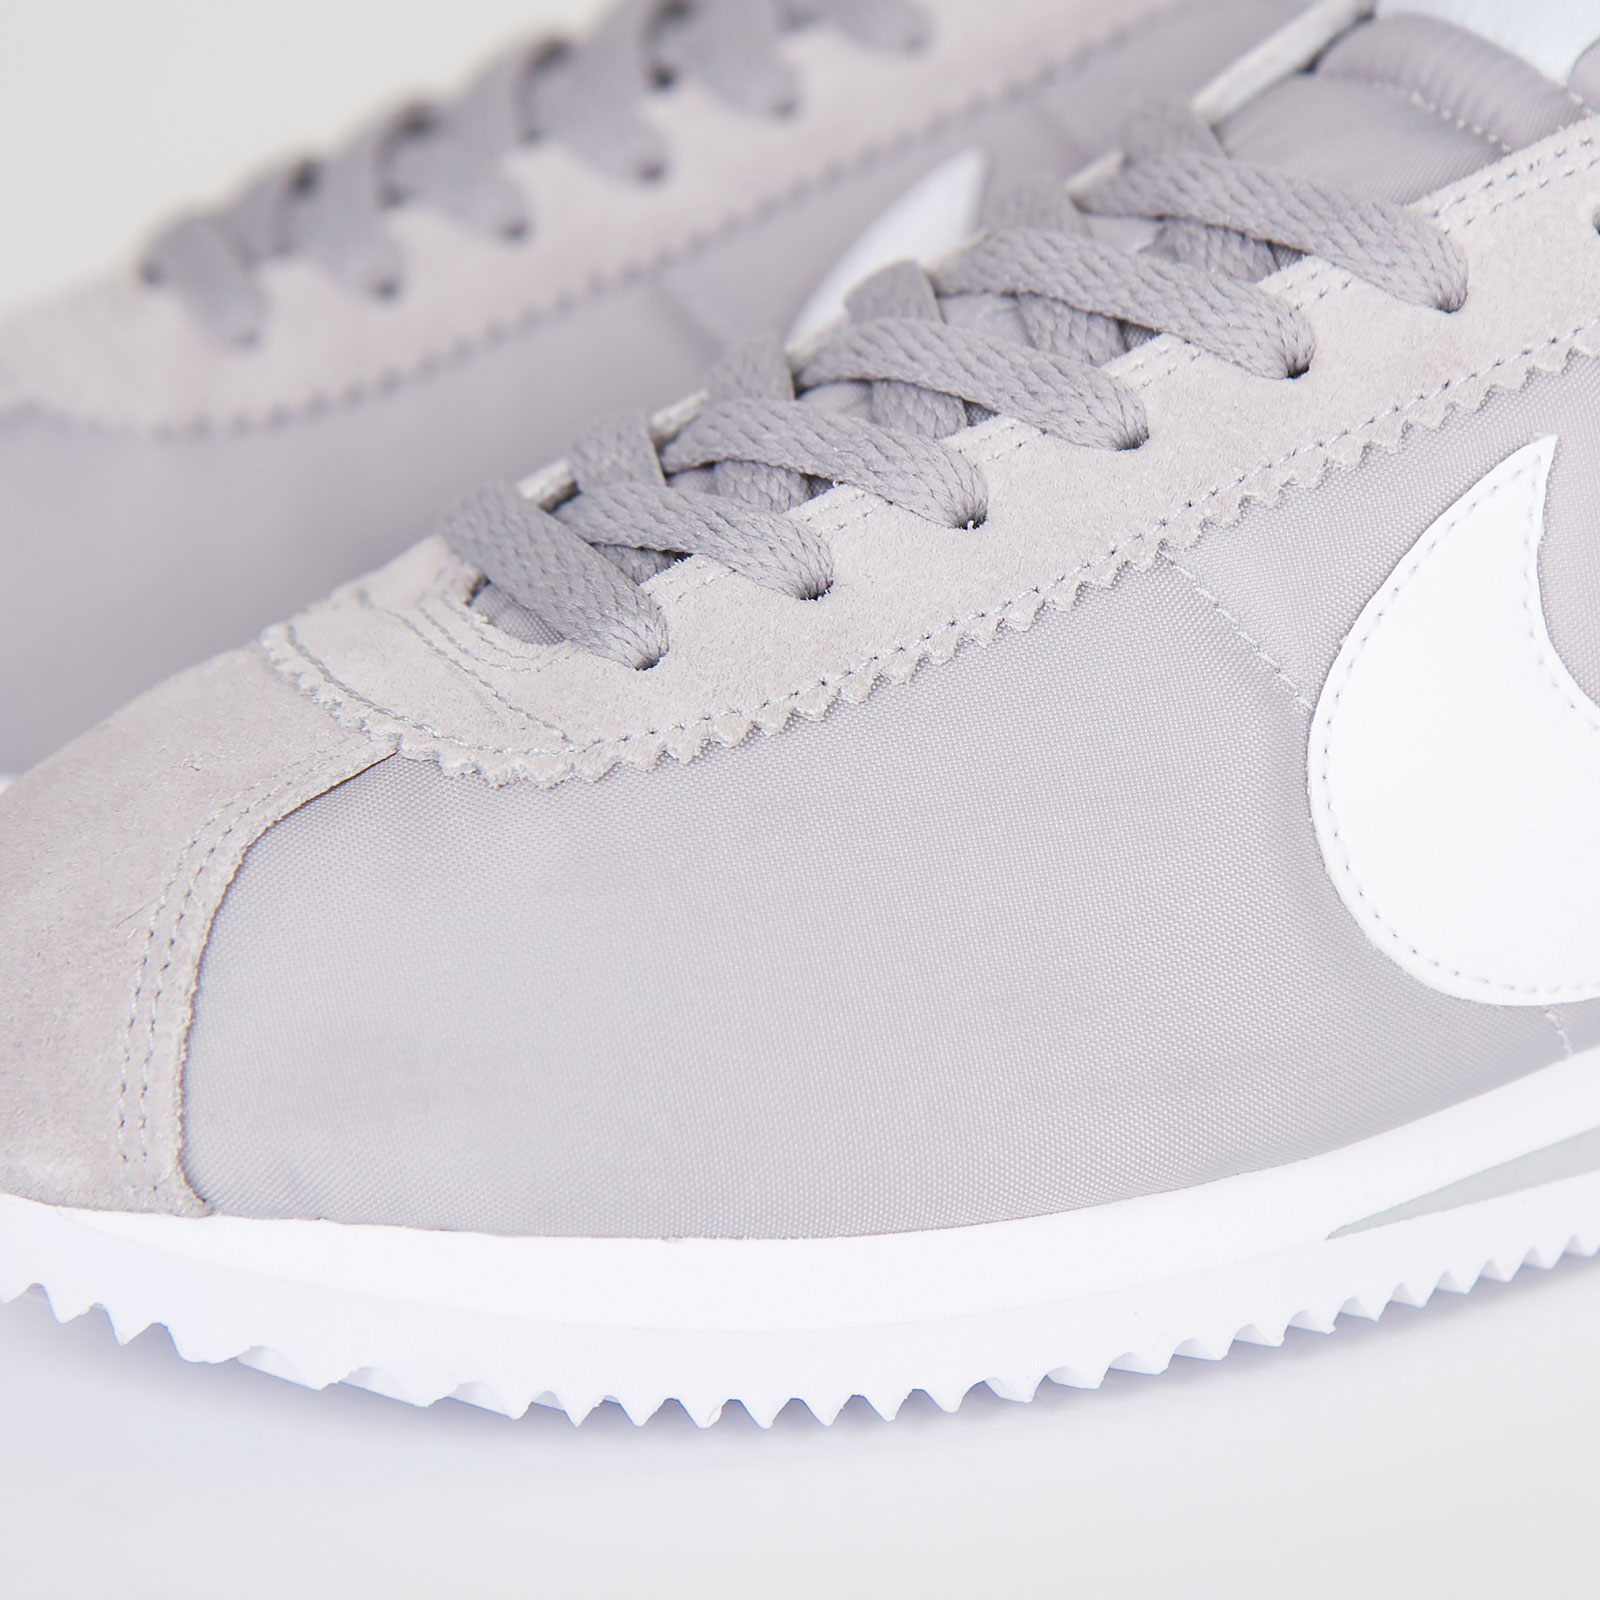 carpintero Sollozos cinturón  Nike Classic Cortez Nylon - 532487-018 - Sneakersnstuff | sneakers &  streetwear online since 1999